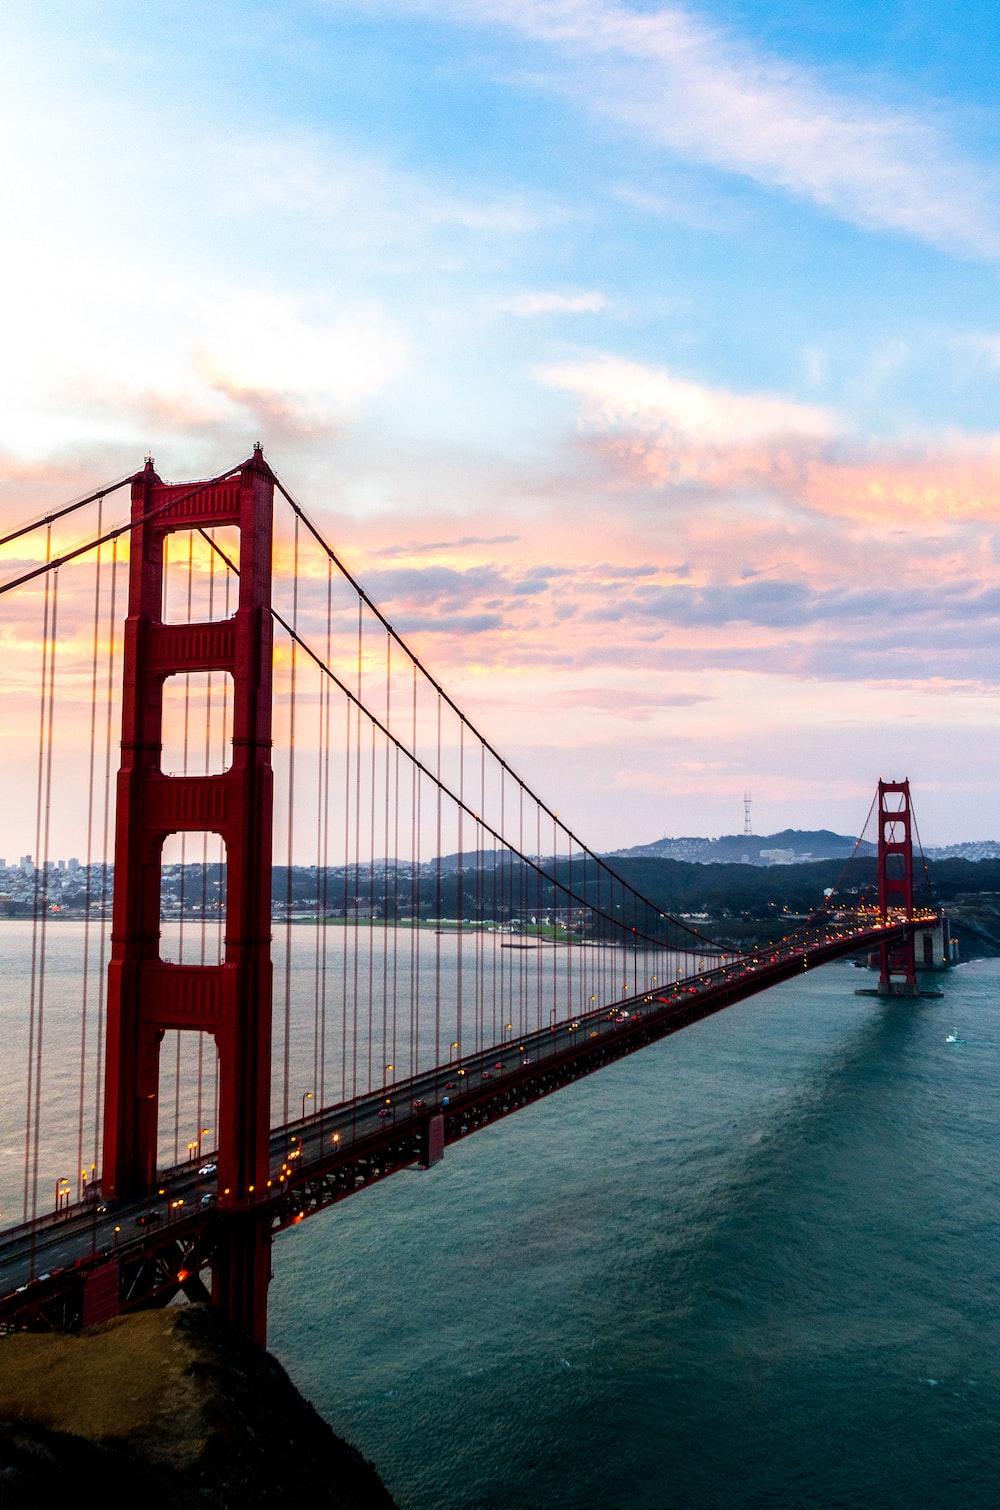 cars in Golden Gate bridge